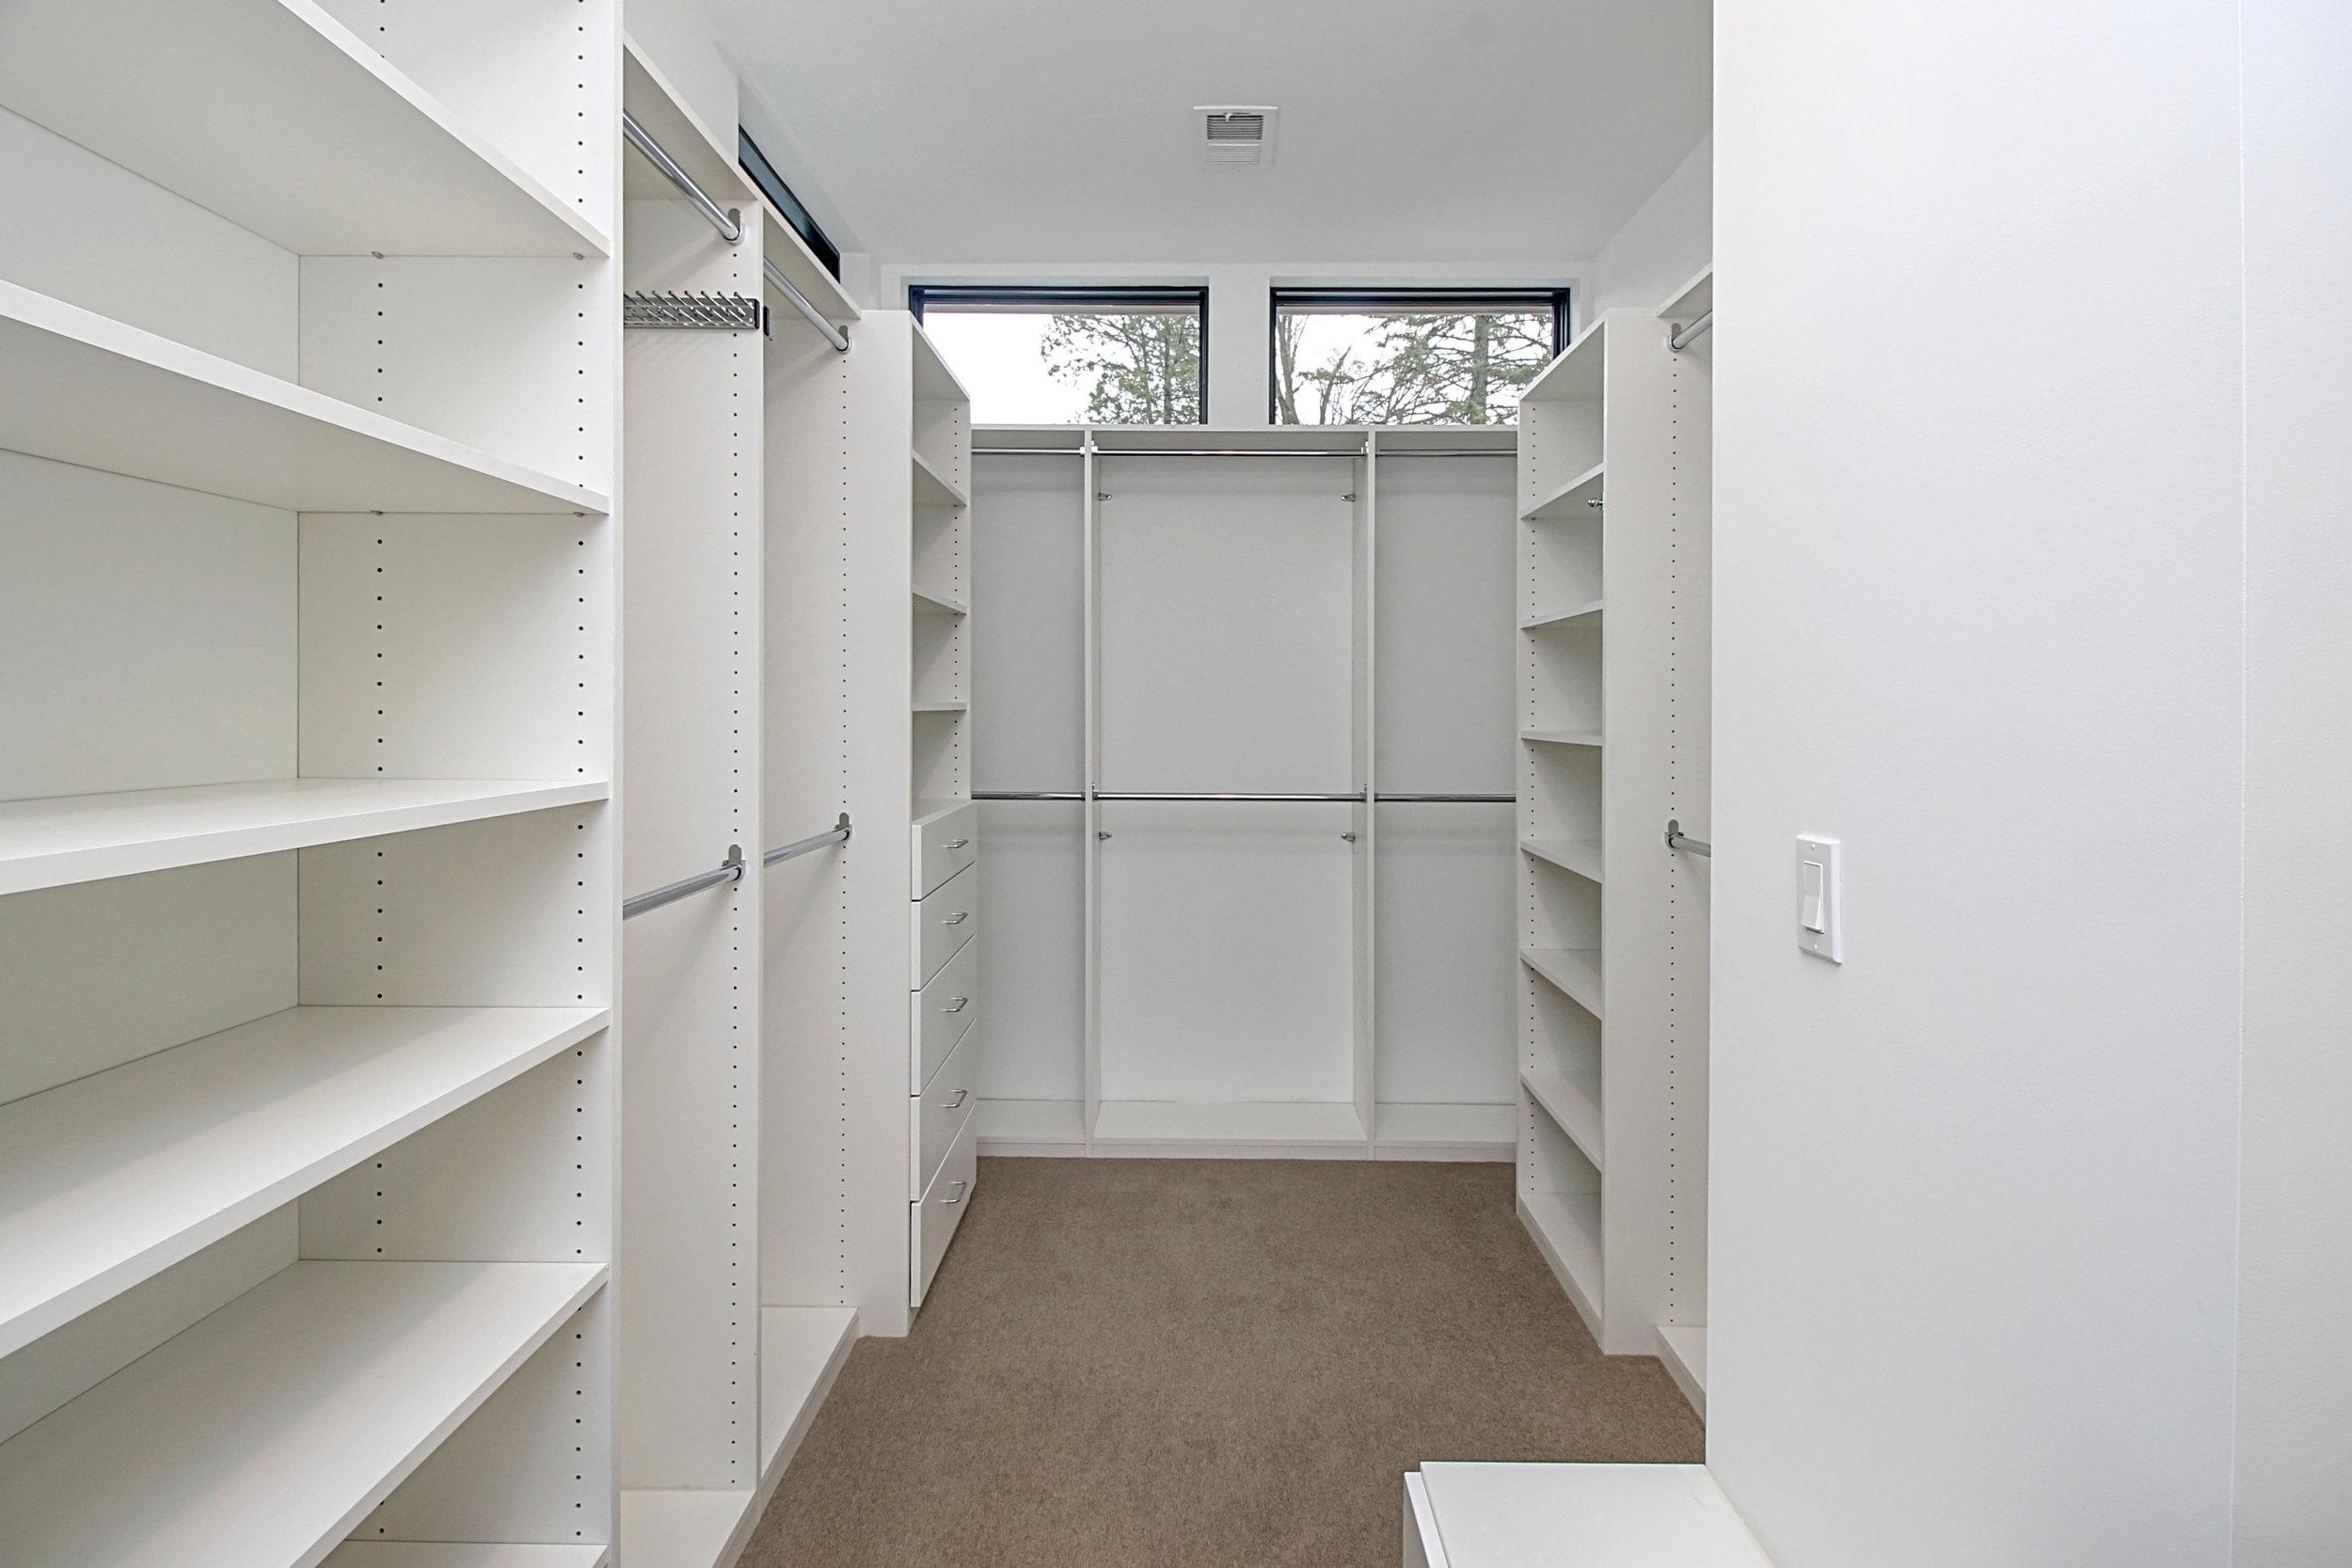 mater closet2.jpg